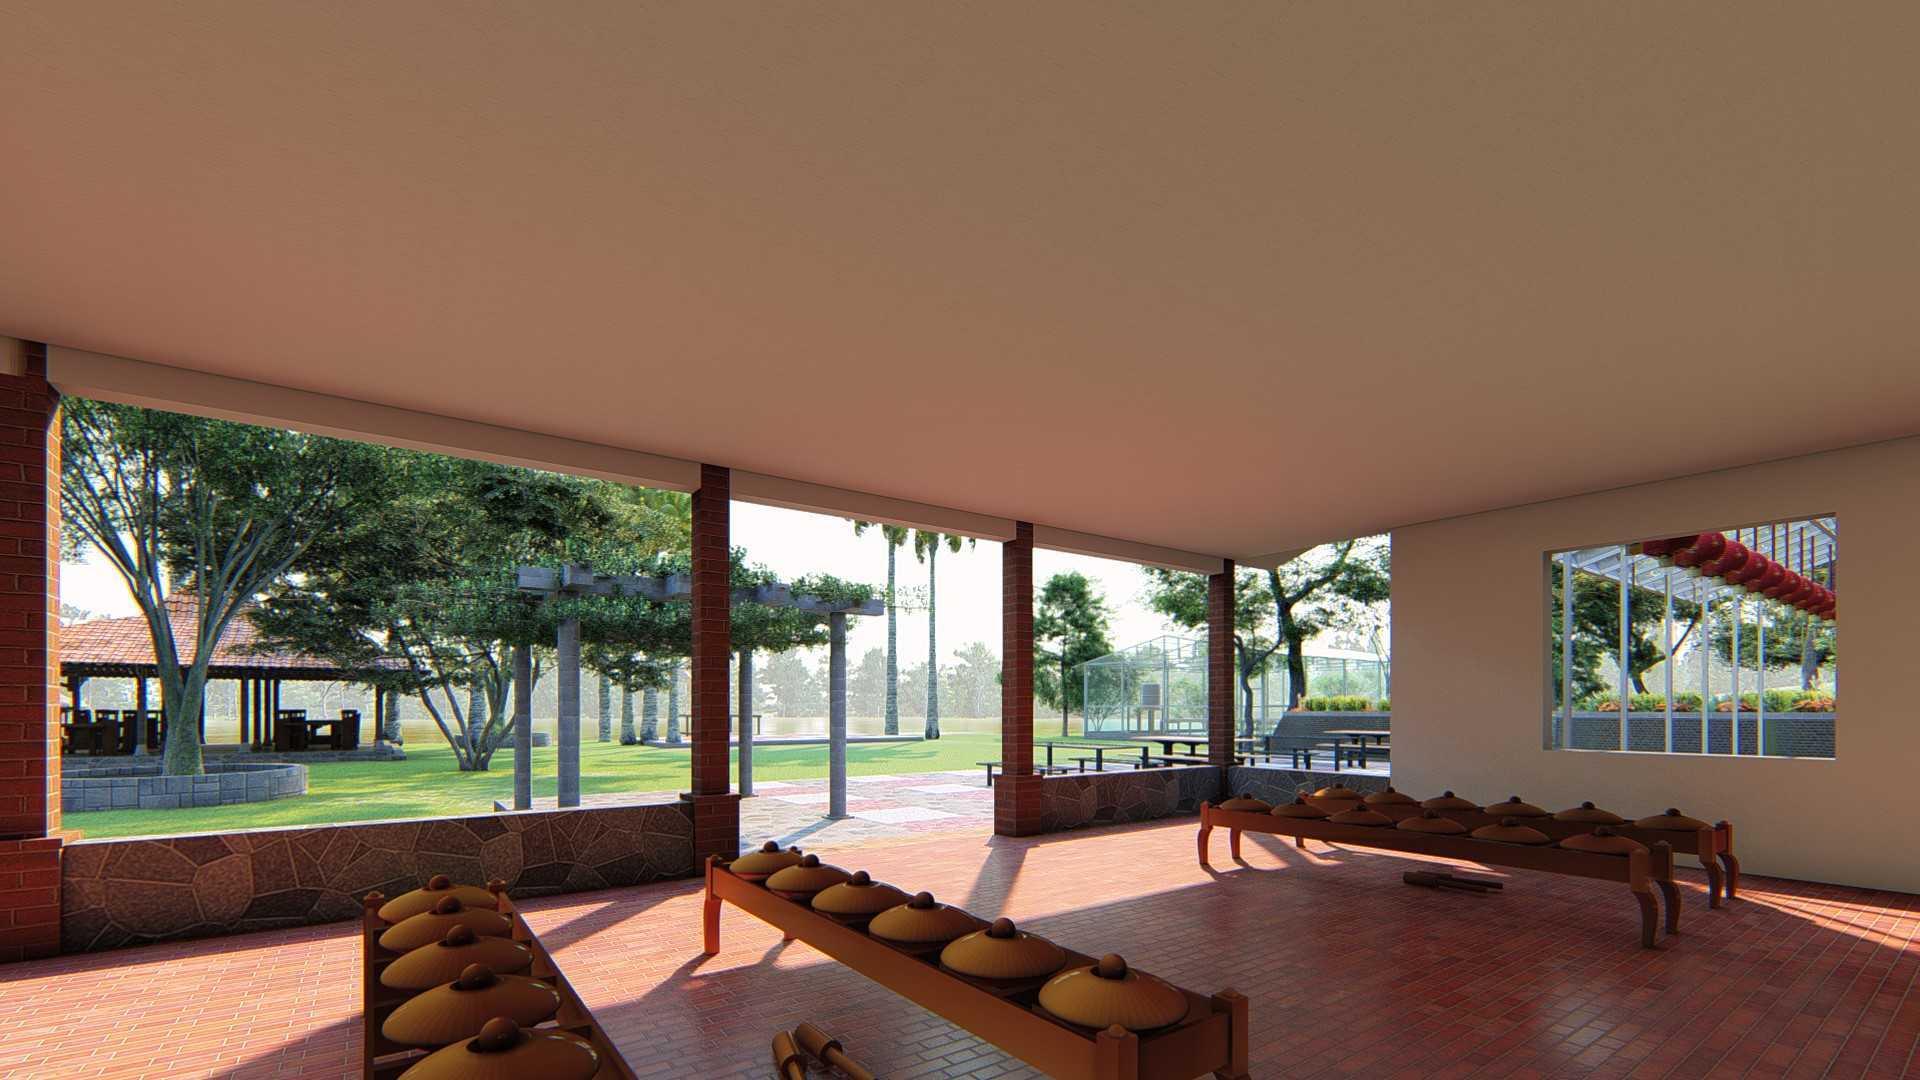 Raden Architect Rumah Wayang Cinwa Bogor, Jawa Barat, Indonesia Bogor, Jawa Barat, Indonesia Raden-Architect-Rumah-Wayang-Cinwa   79835